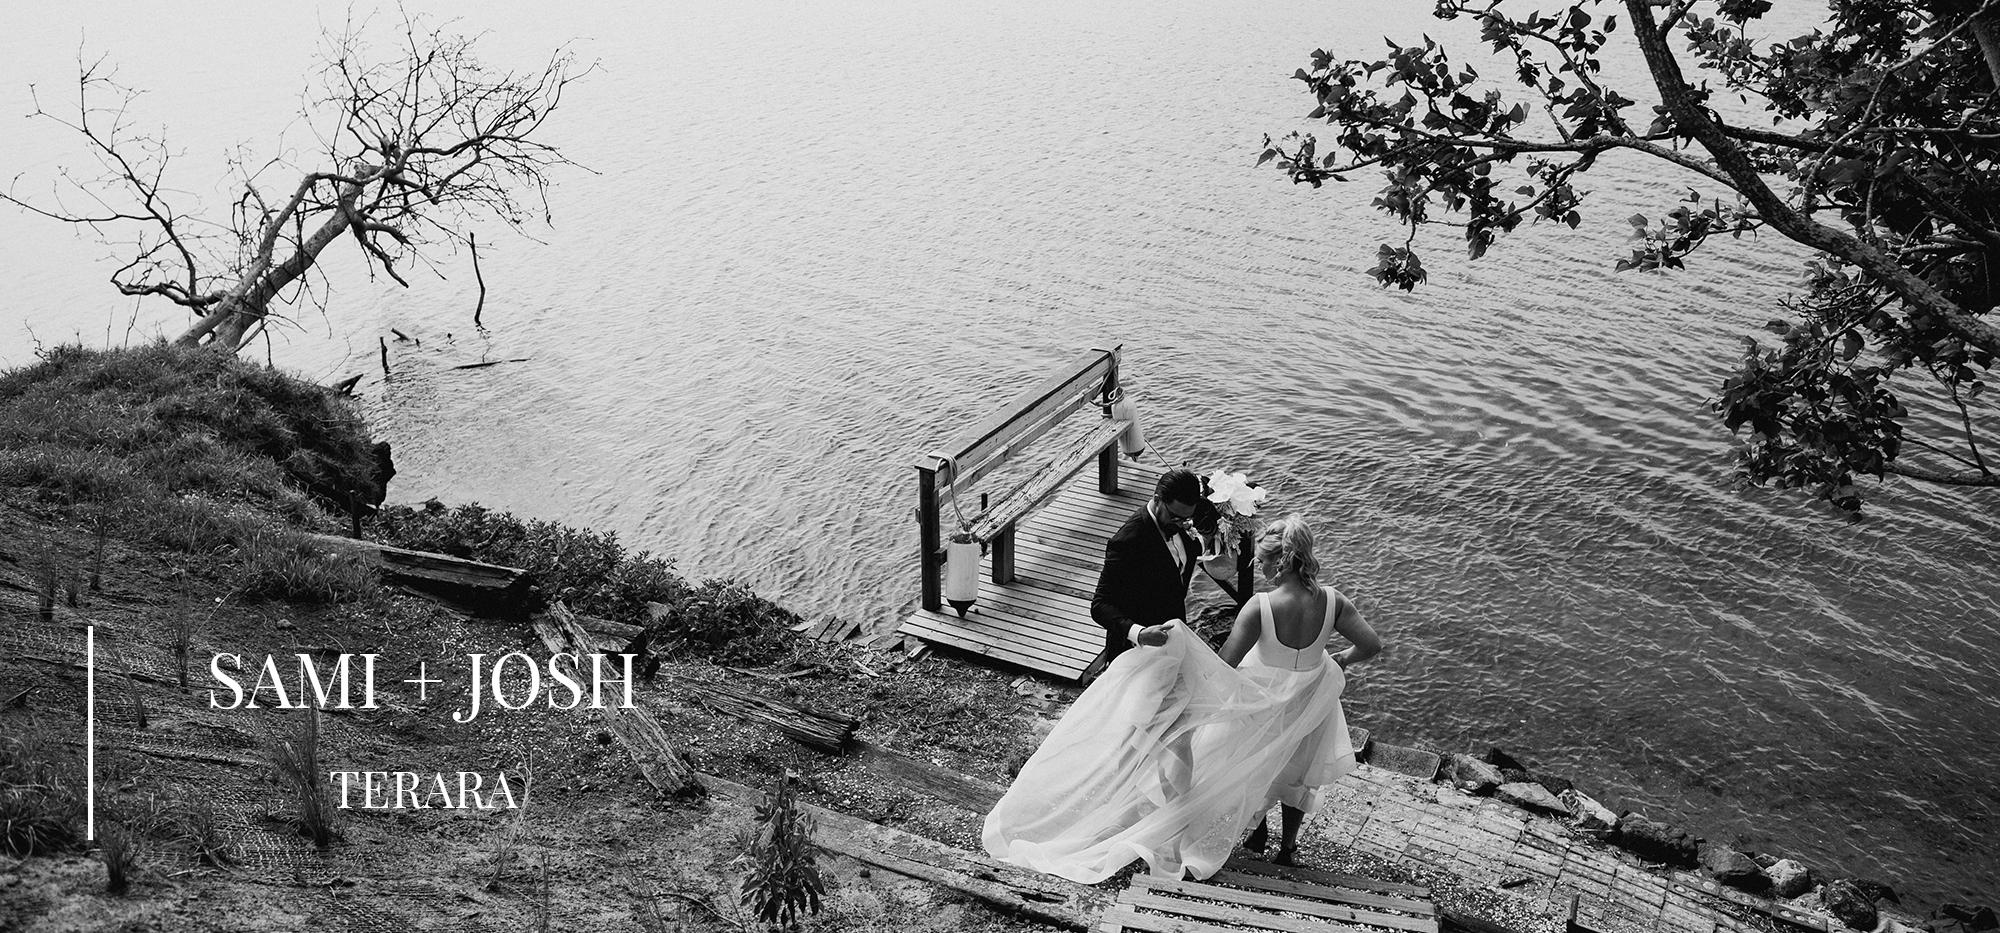 SAMI_JOSH-COVER.jpg